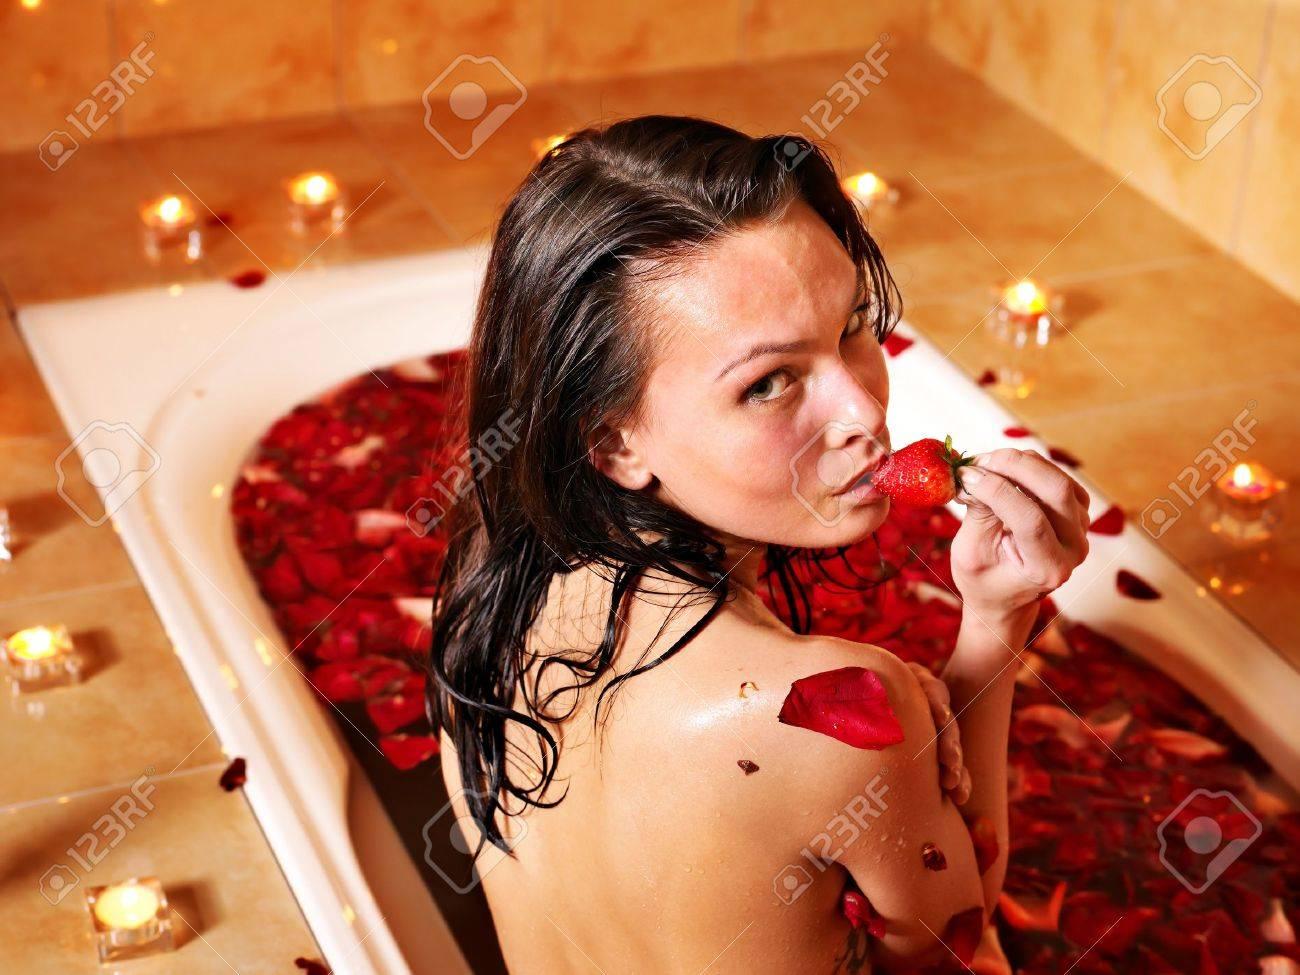 Woman swimming of bath tub. Stock Photo - 9620151